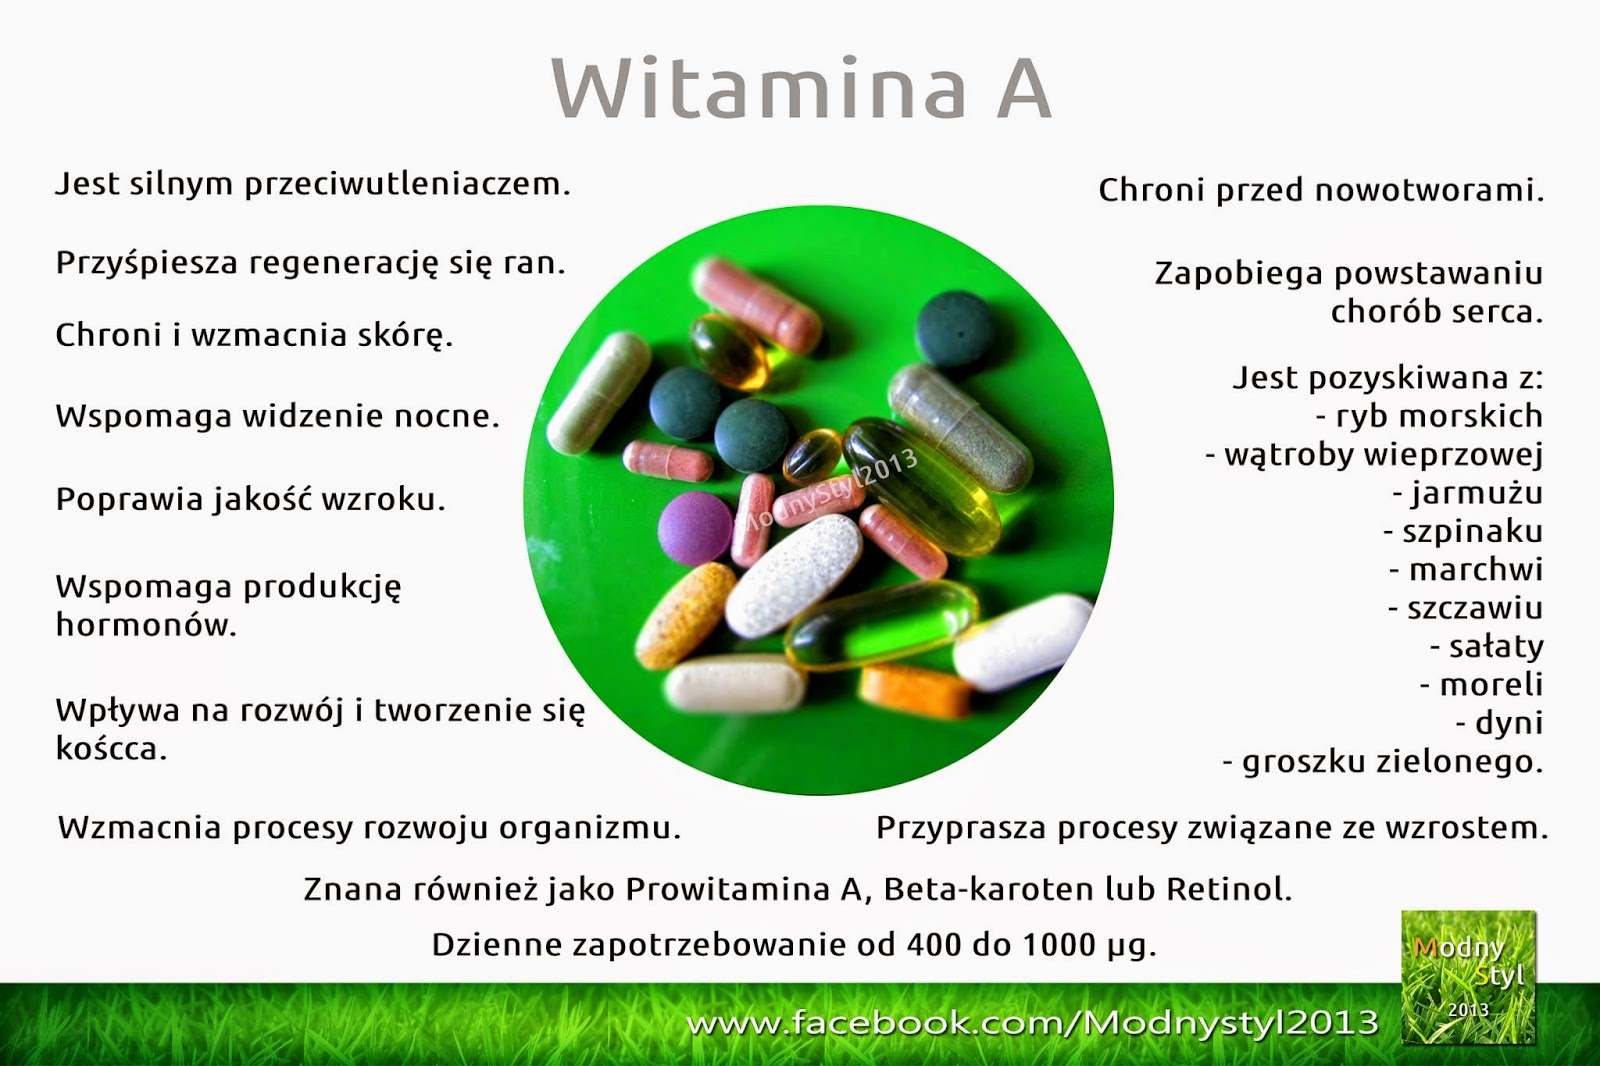 Witamina A, beta-karoten lub retinol